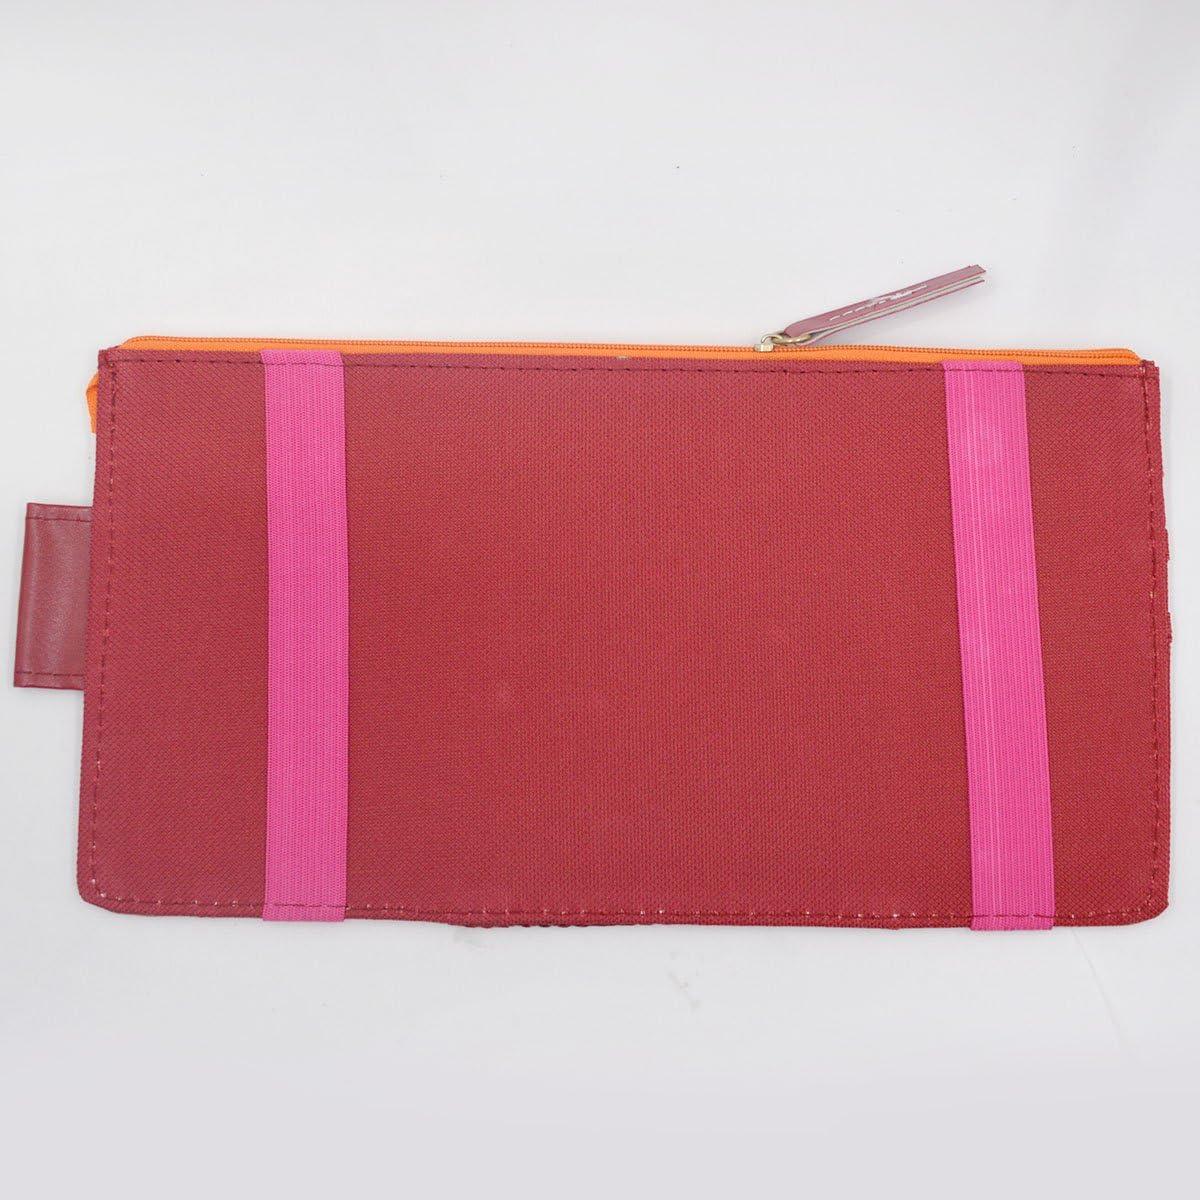 Mily Multi-Purpose Car Visor Organizer Sun Shade CD Holder Card Storage Pouch Bag Wine Red